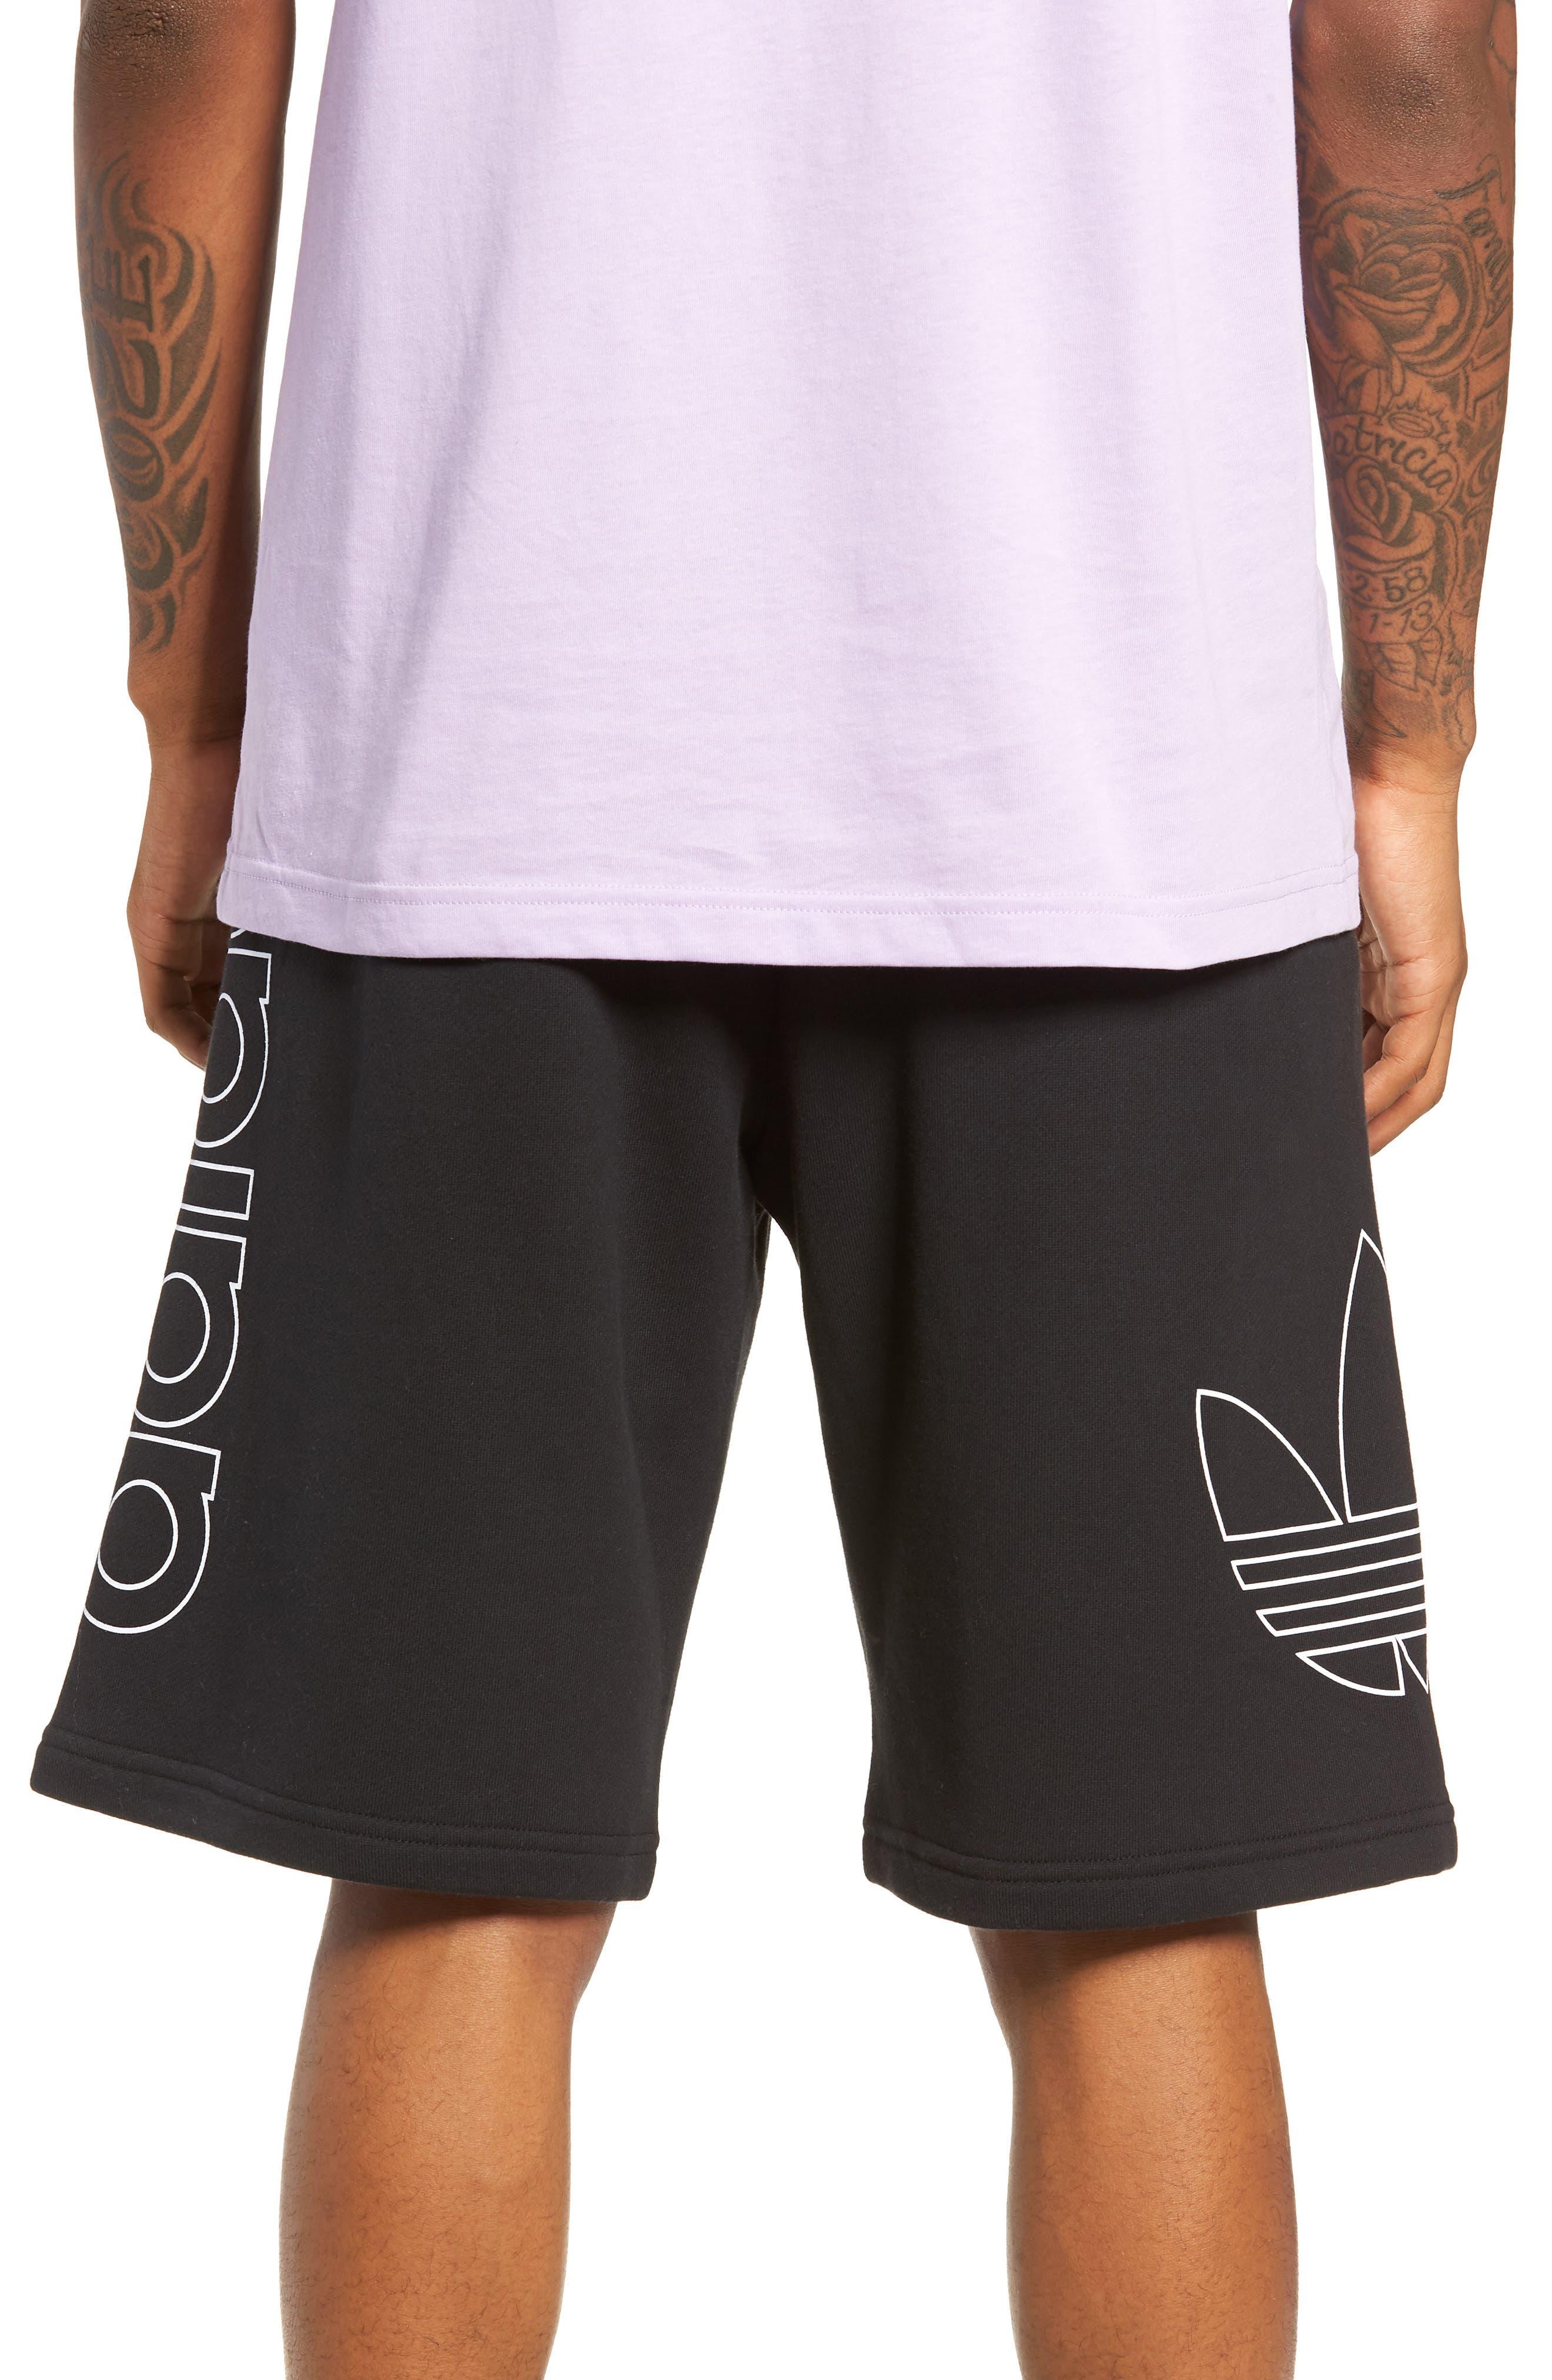 ADIDAS ORIGINALS, FT OTLN Athletic Shorts, Alternate thumbnail 2, color, BLACK/ WHITE